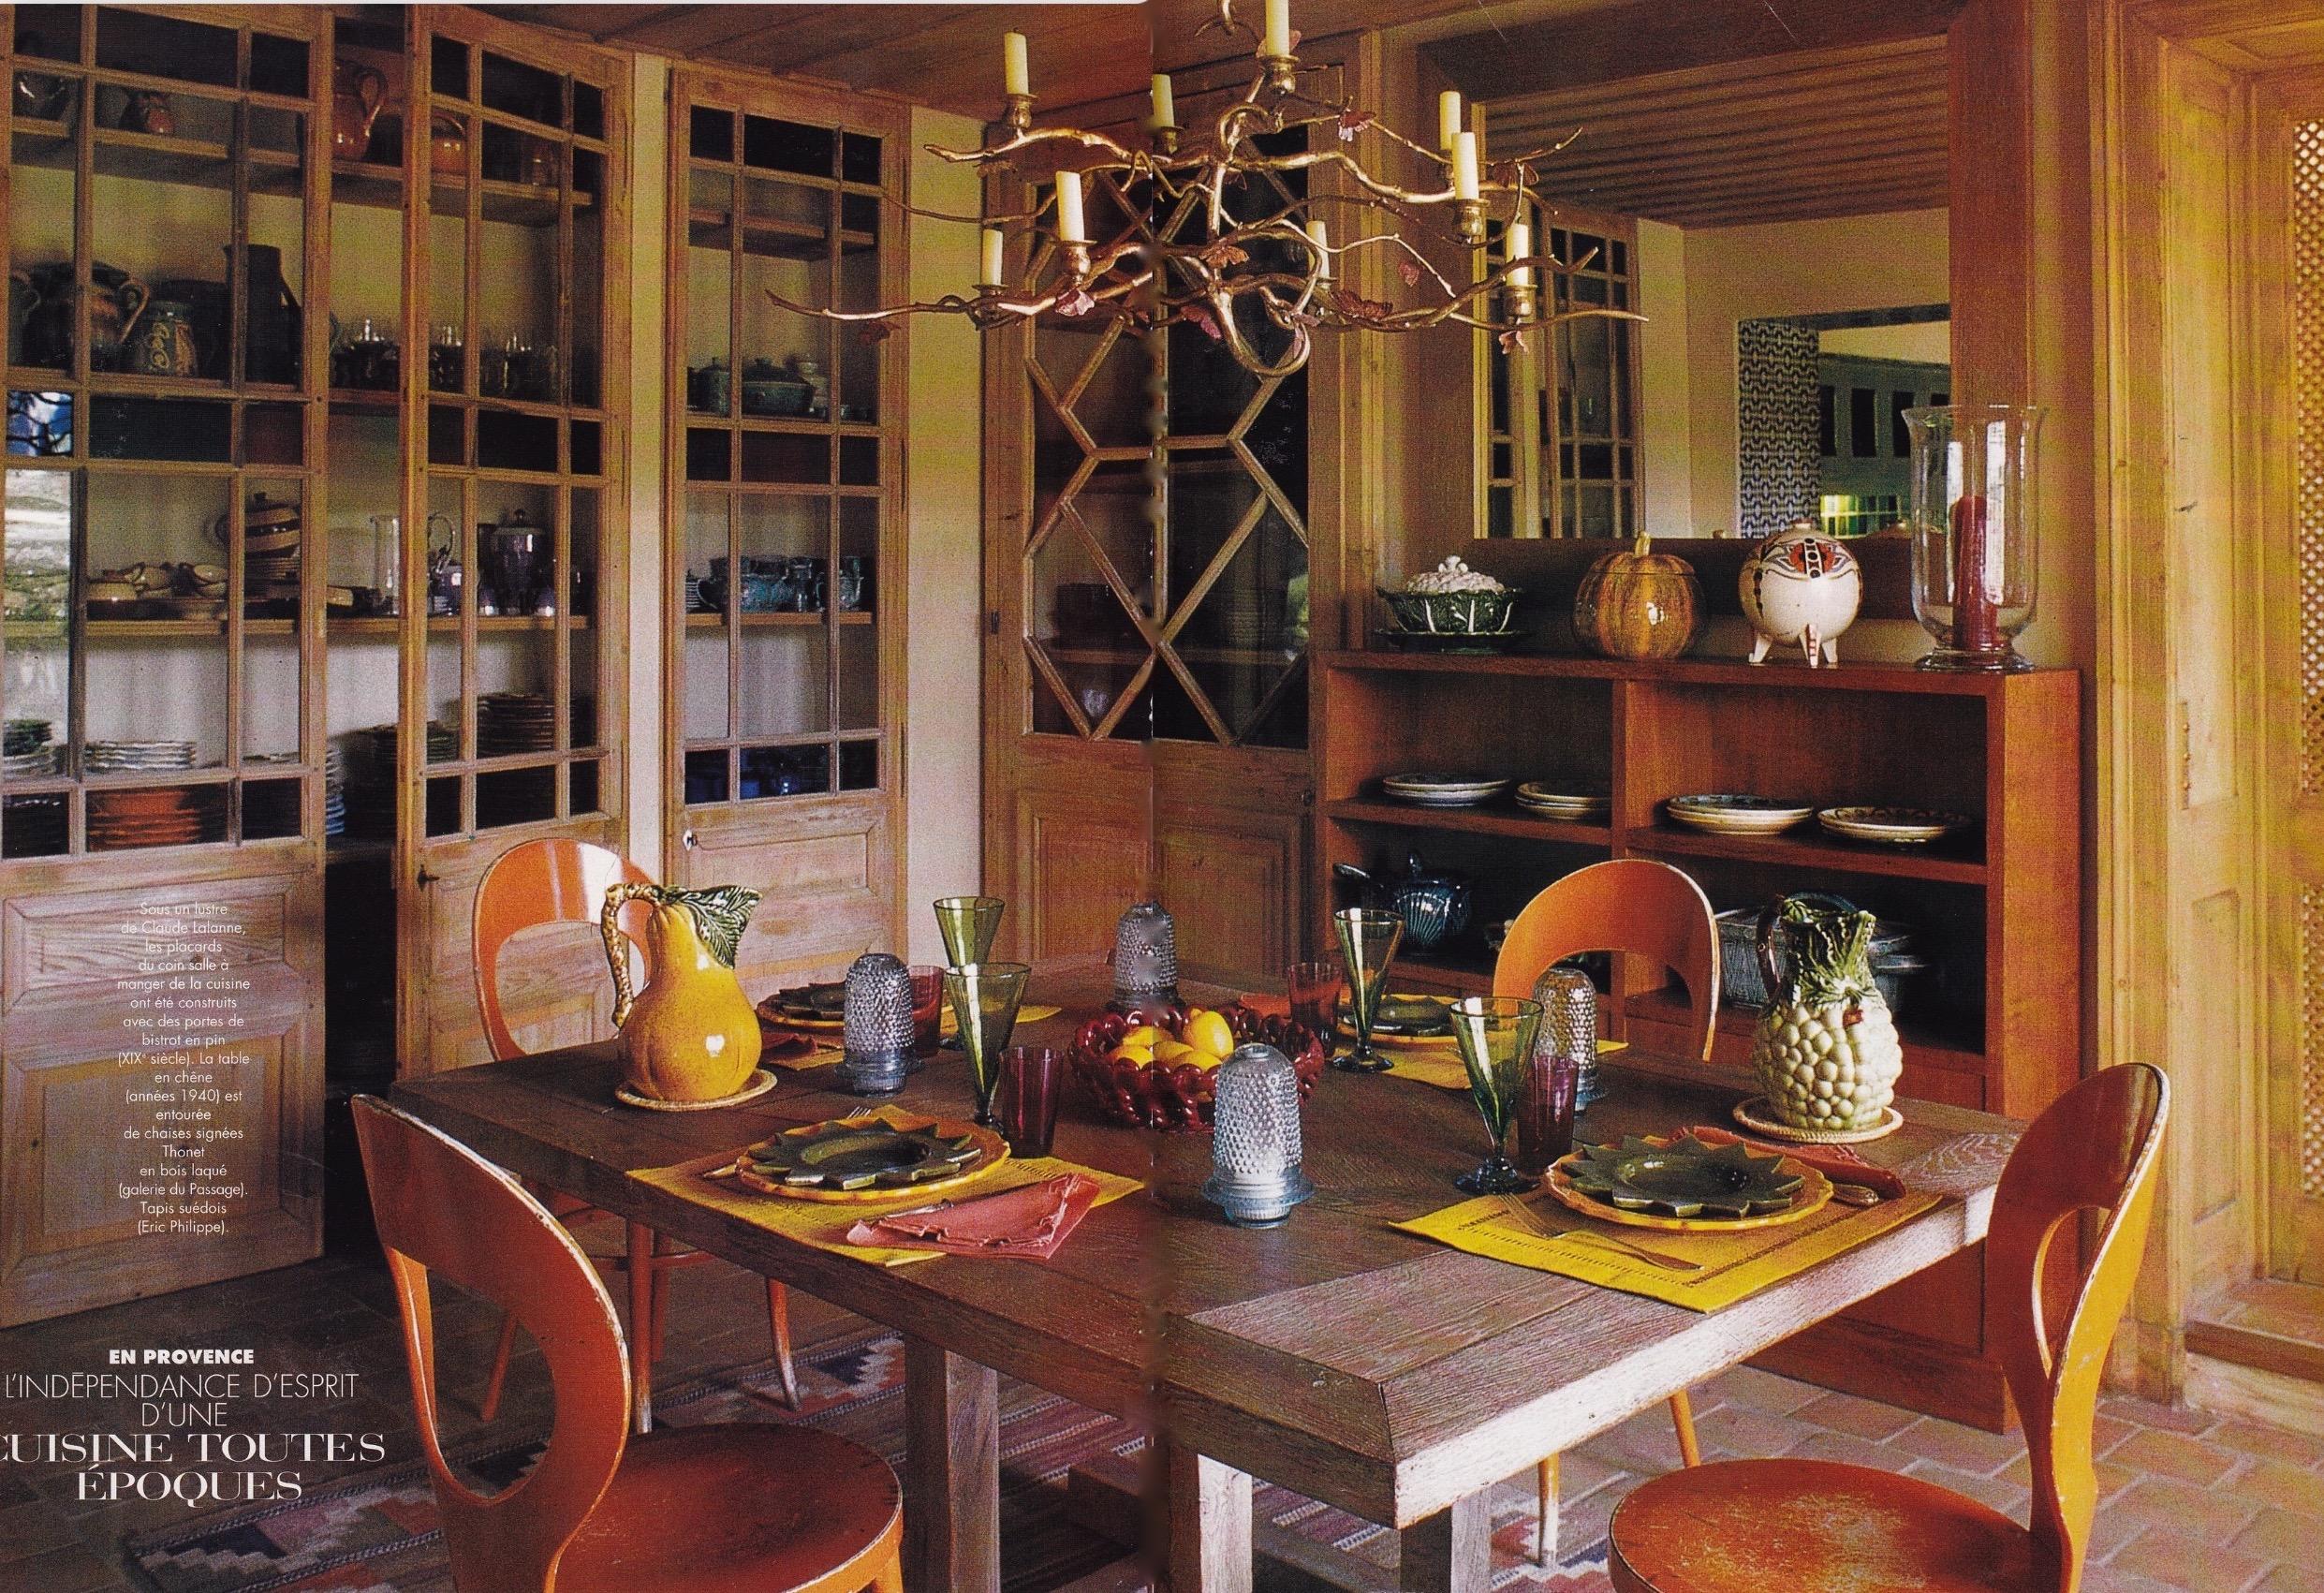 Haut Provencal Cristopher Worthland Interiors